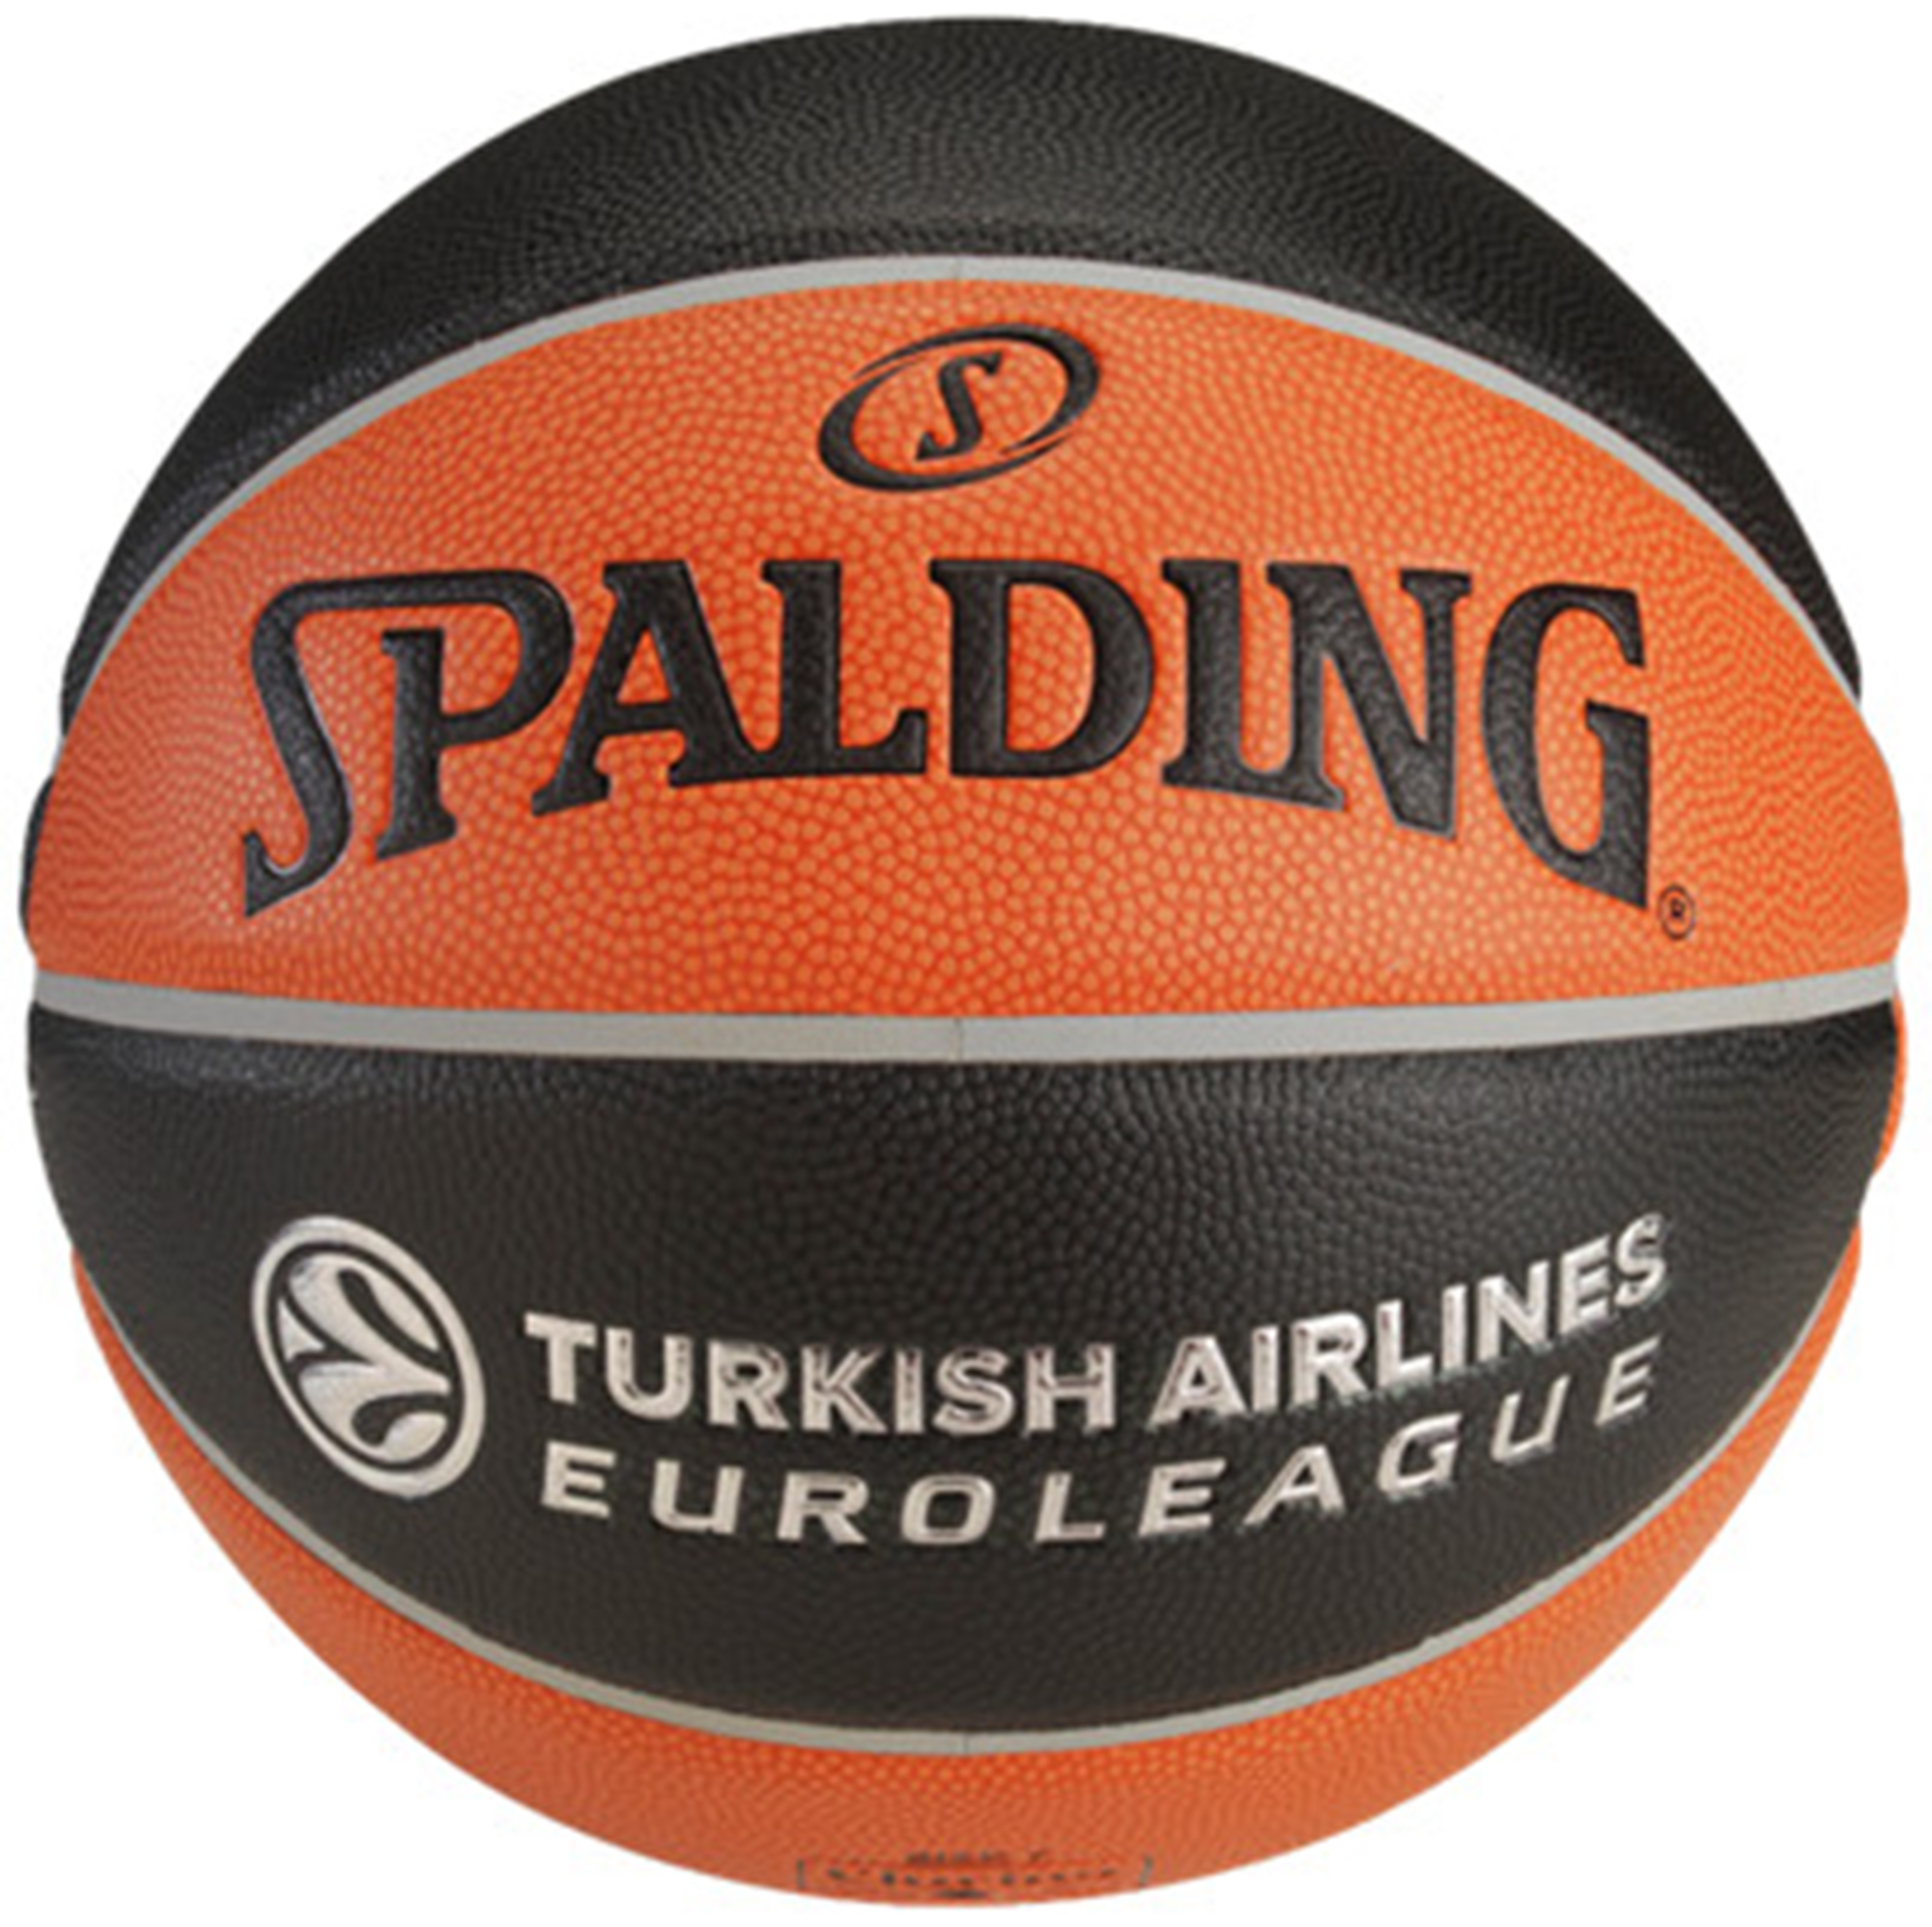 Spalding Мяч баскетбольный Spalding TF-1000 мяч баскетбольный spalding tf 33